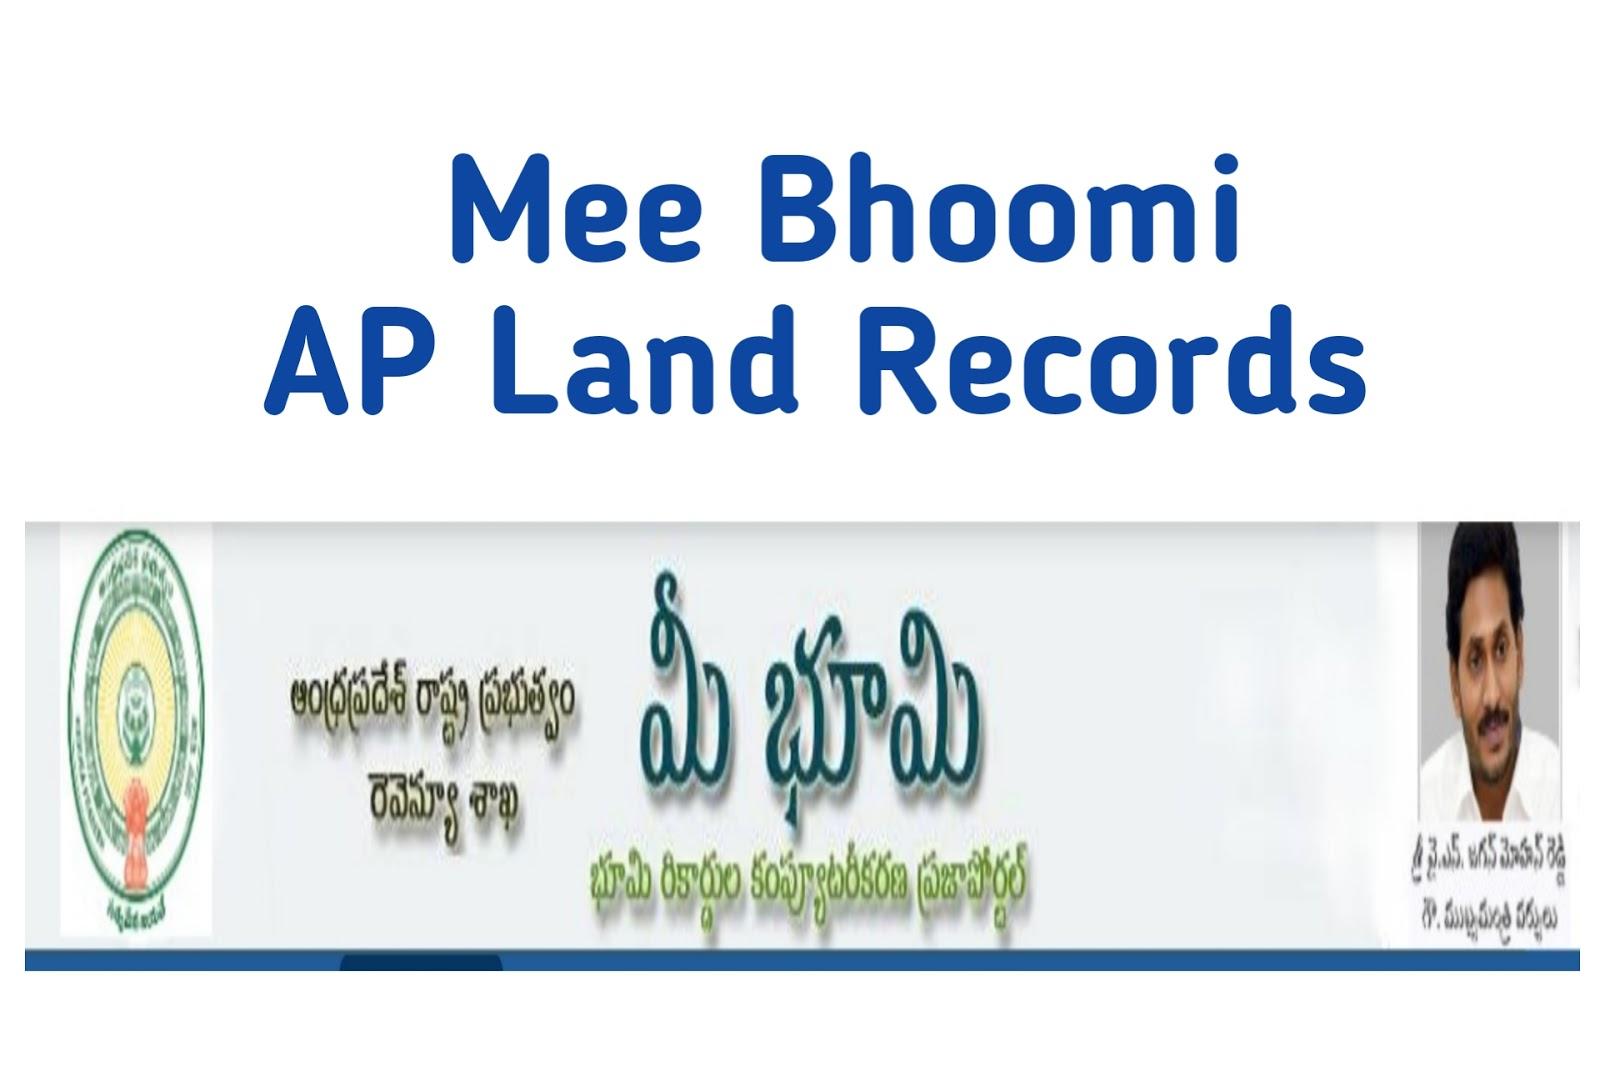 Mee Bhoomi, Mee Bhoomi AP, Mee Bhoomi 1b